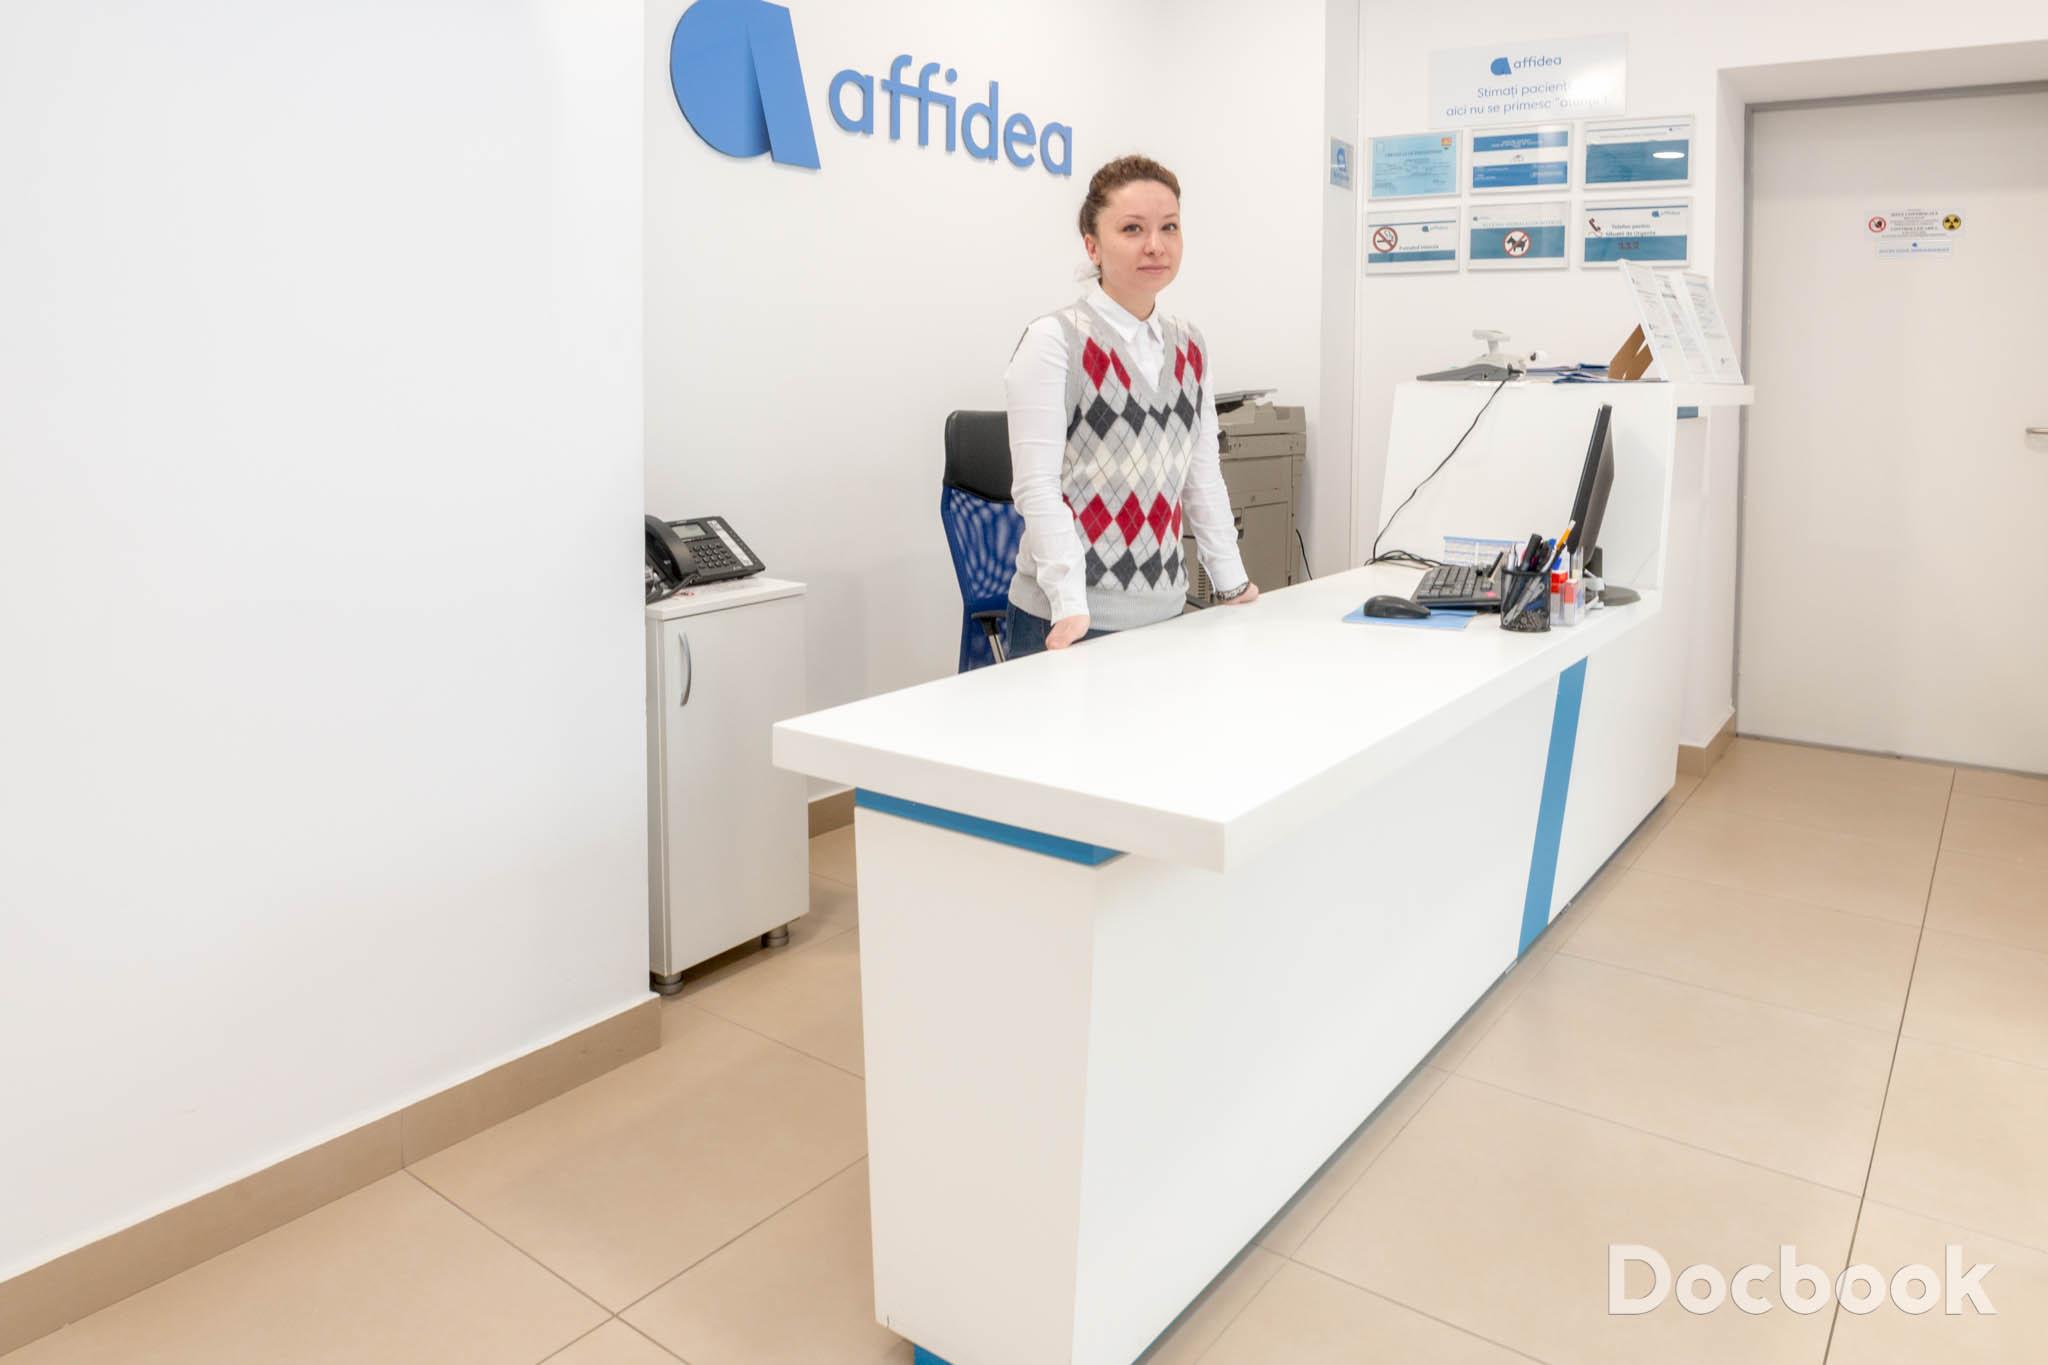 Clinica Affidea - Timisoara